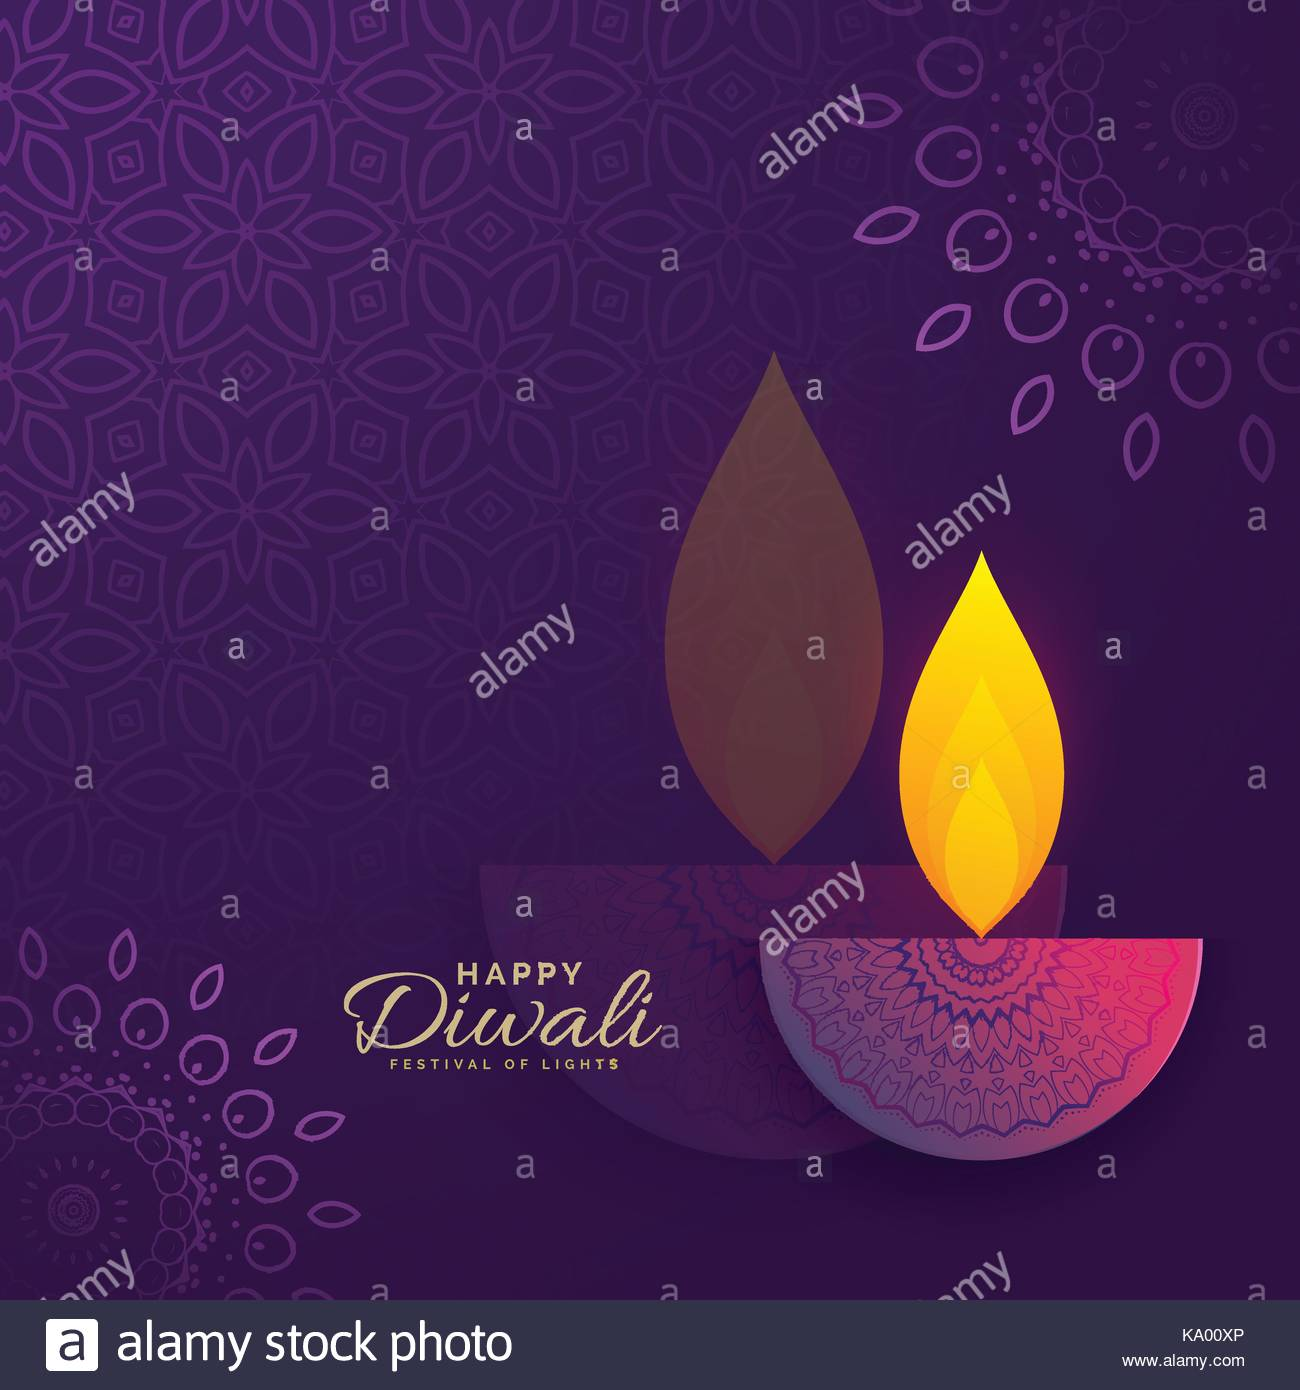 Diwali greeting card design with creative diya and ornament stock diwali greeting card design with creative diya and ornament decoration m4hsunfo